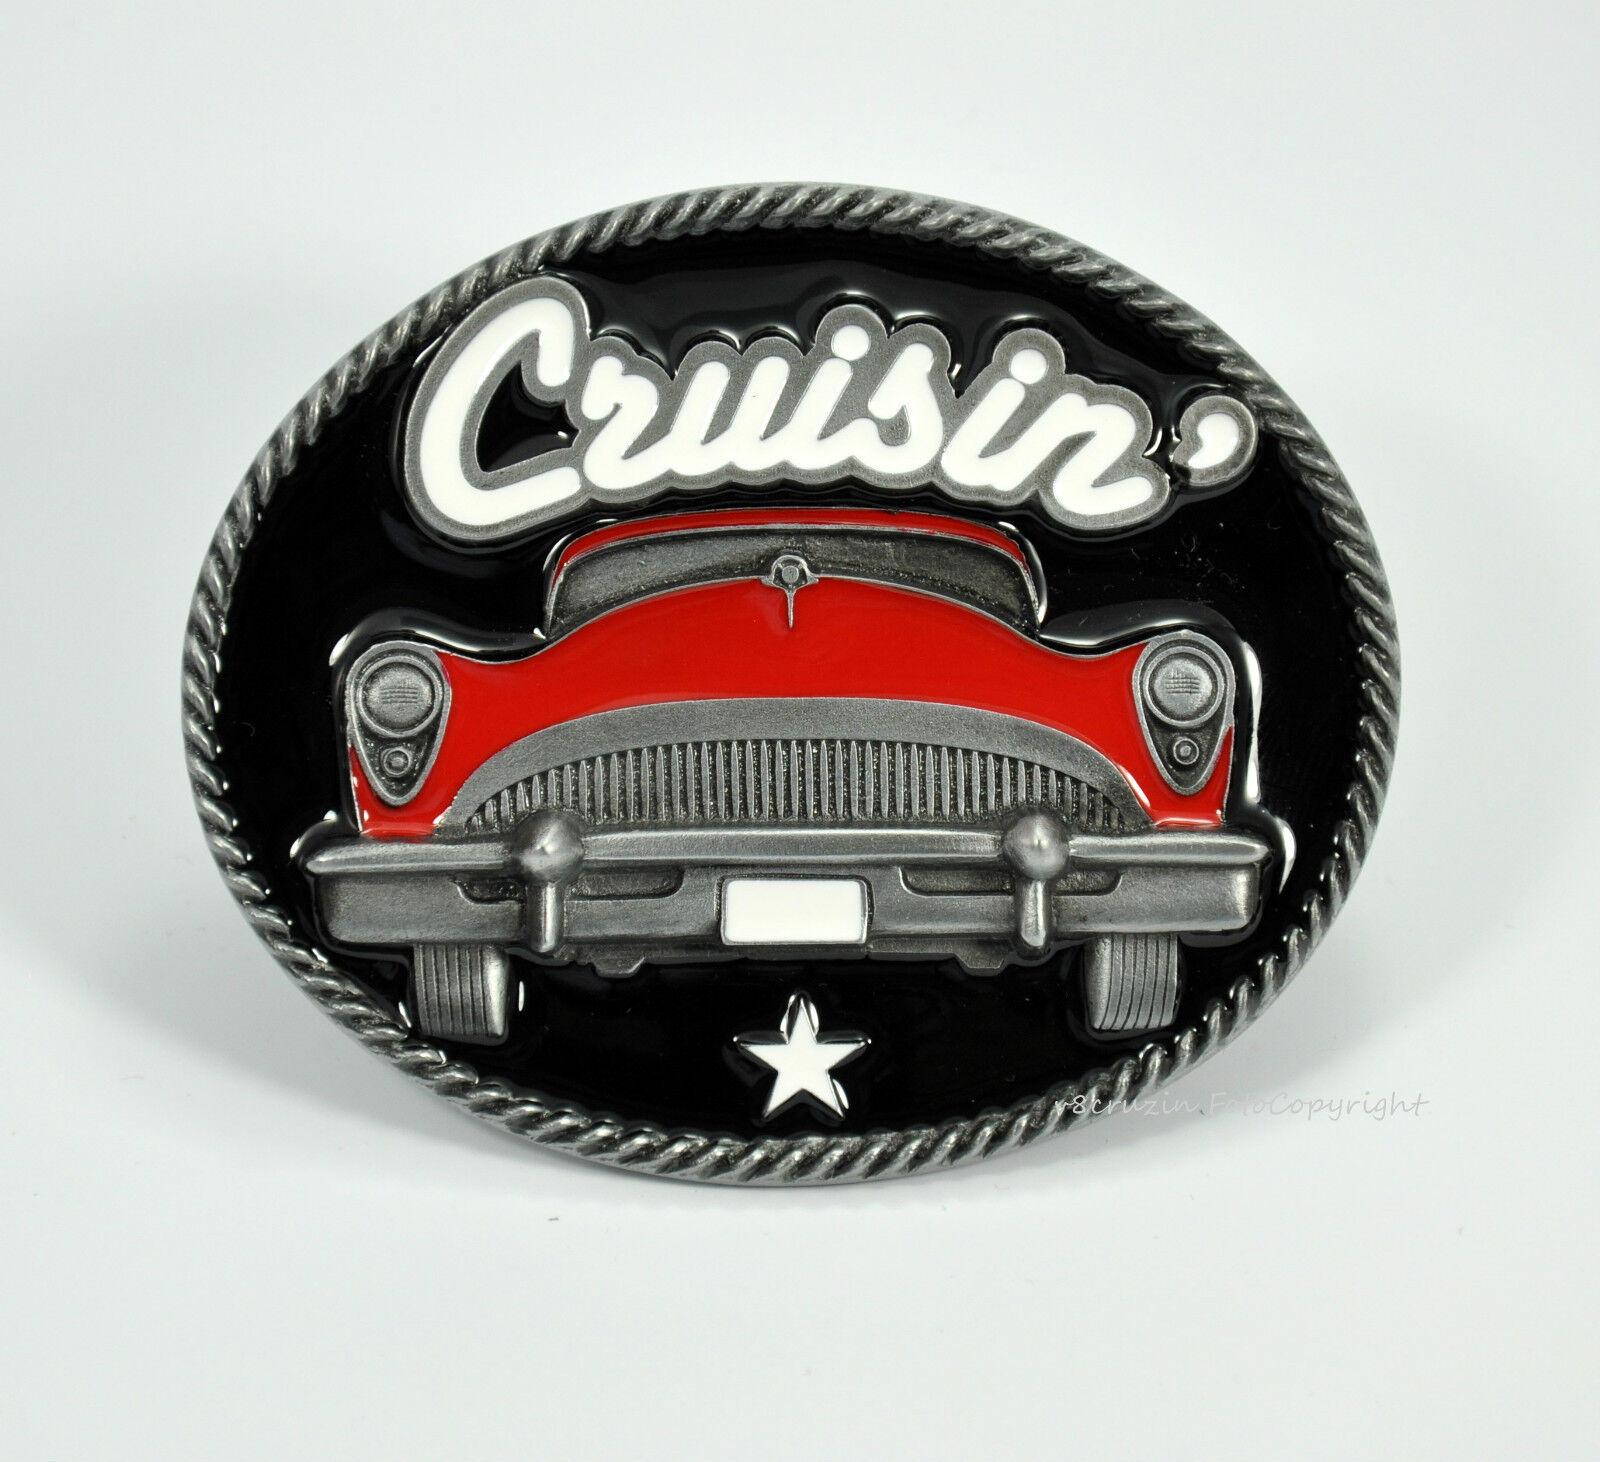 * Rockabilly Buckle Belt 50s Kustom 50er Jahre Auto Hot Rod Gürtelschnalle *566